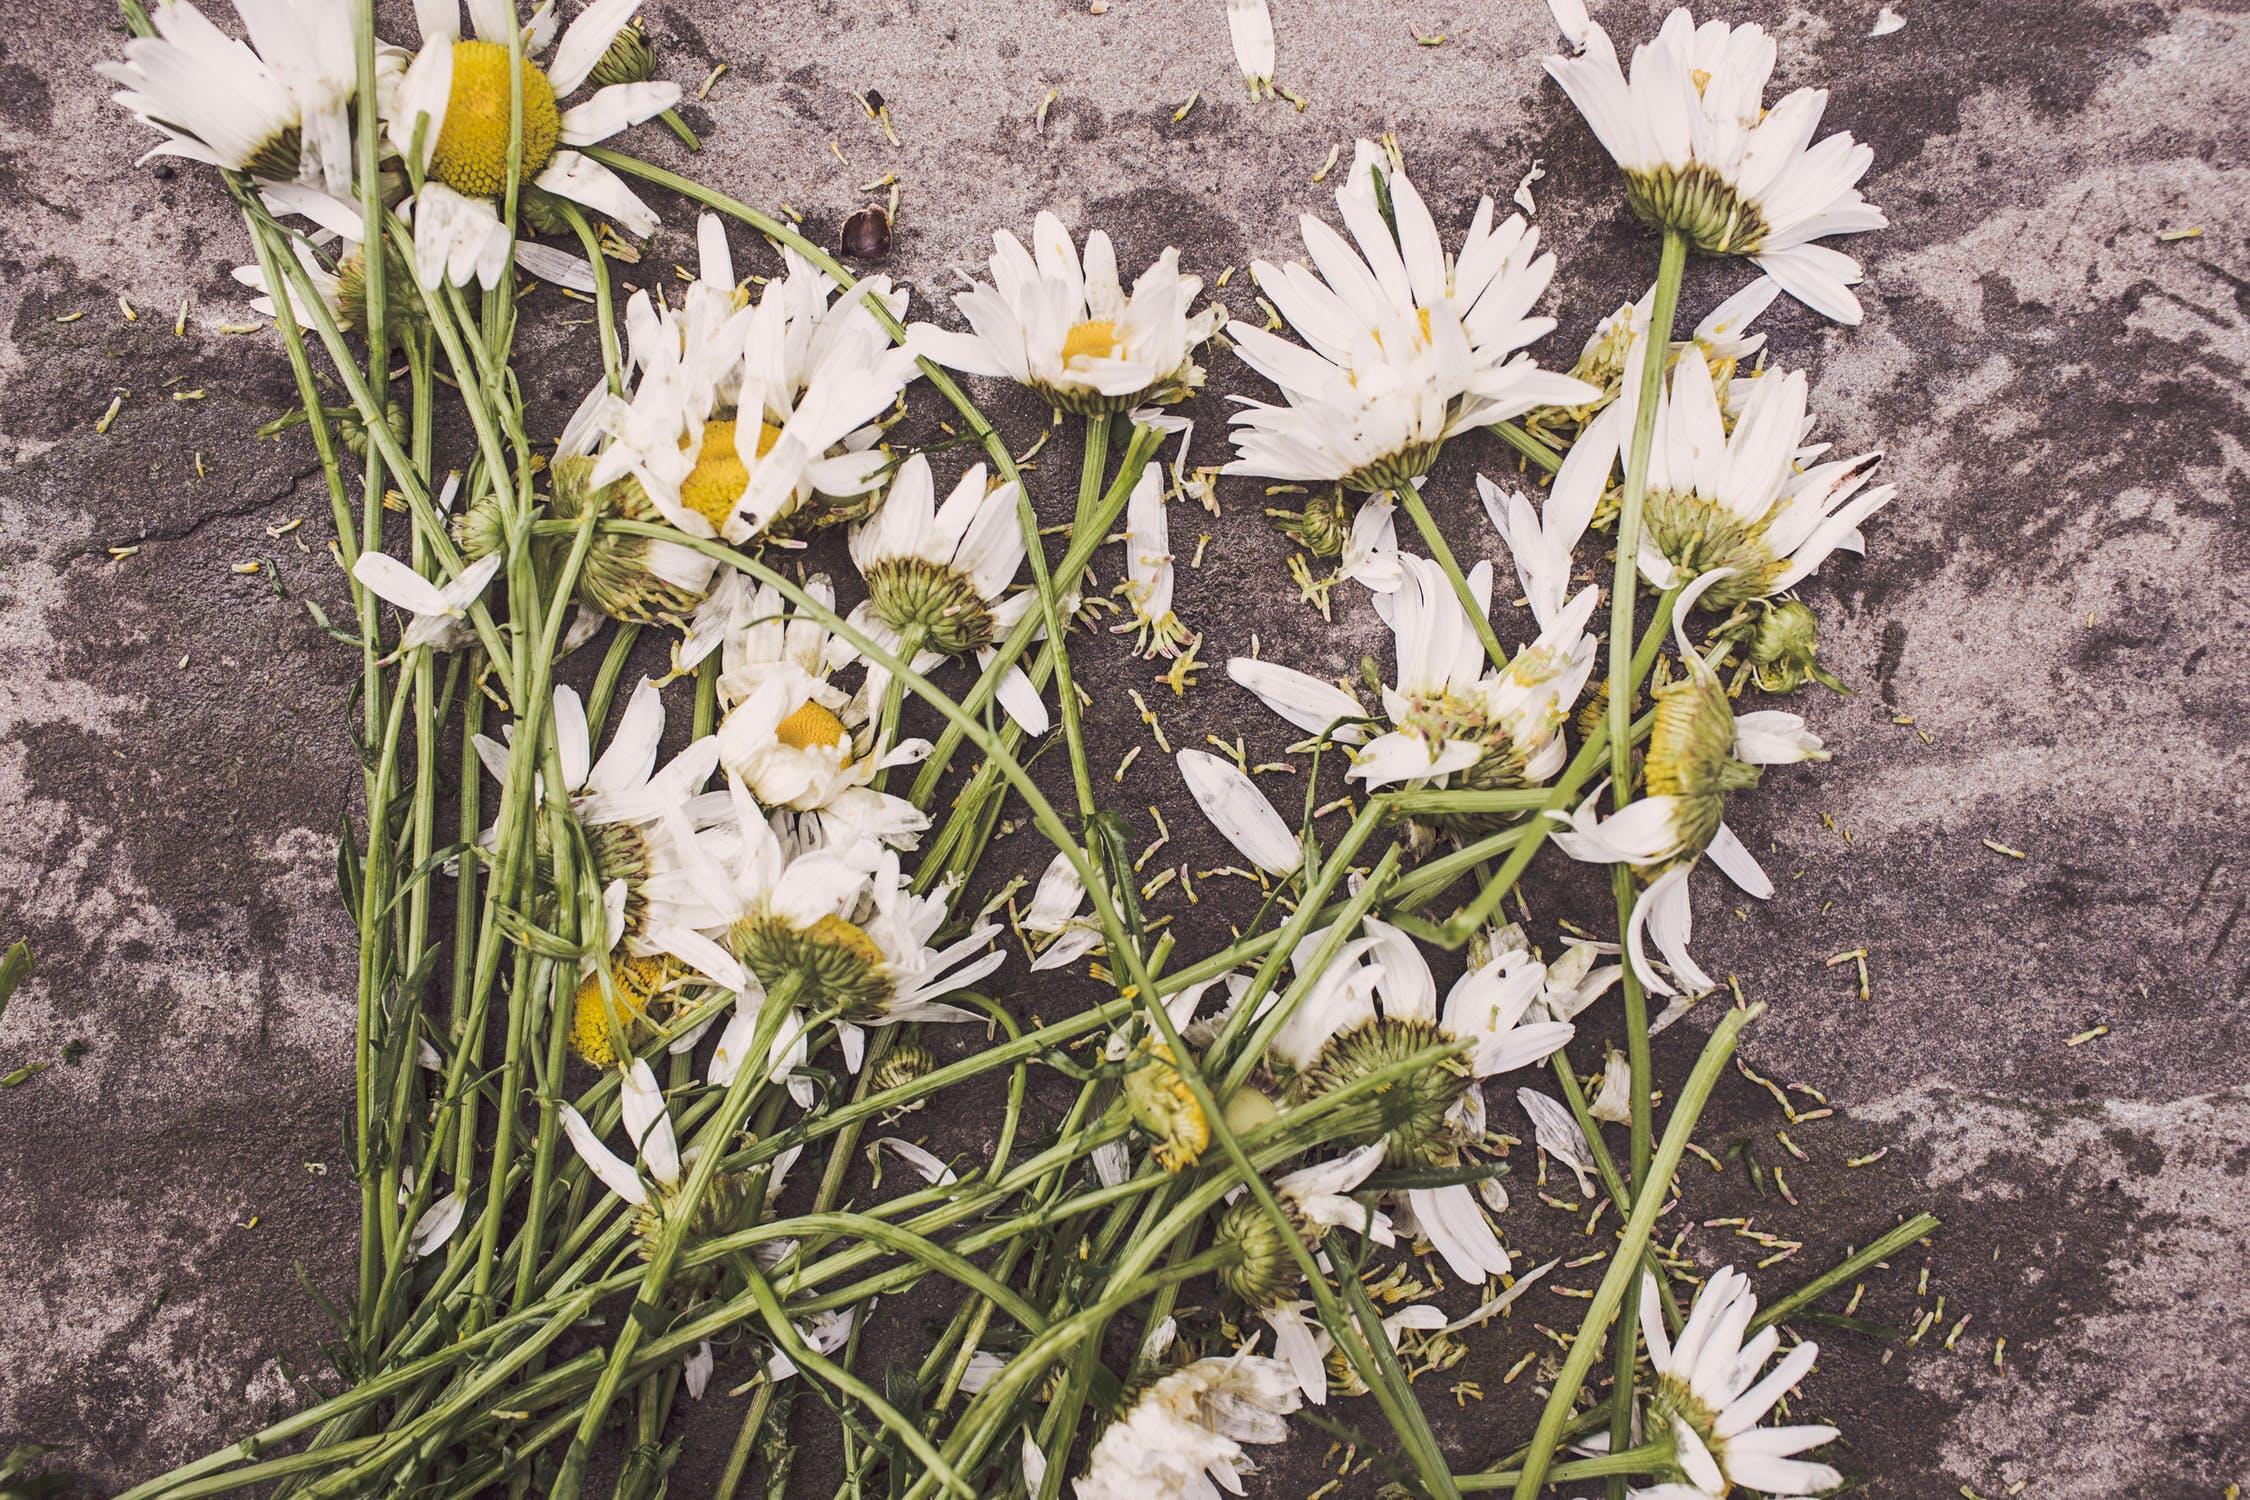 flowers-marguerites-destroyed-dead.jpg